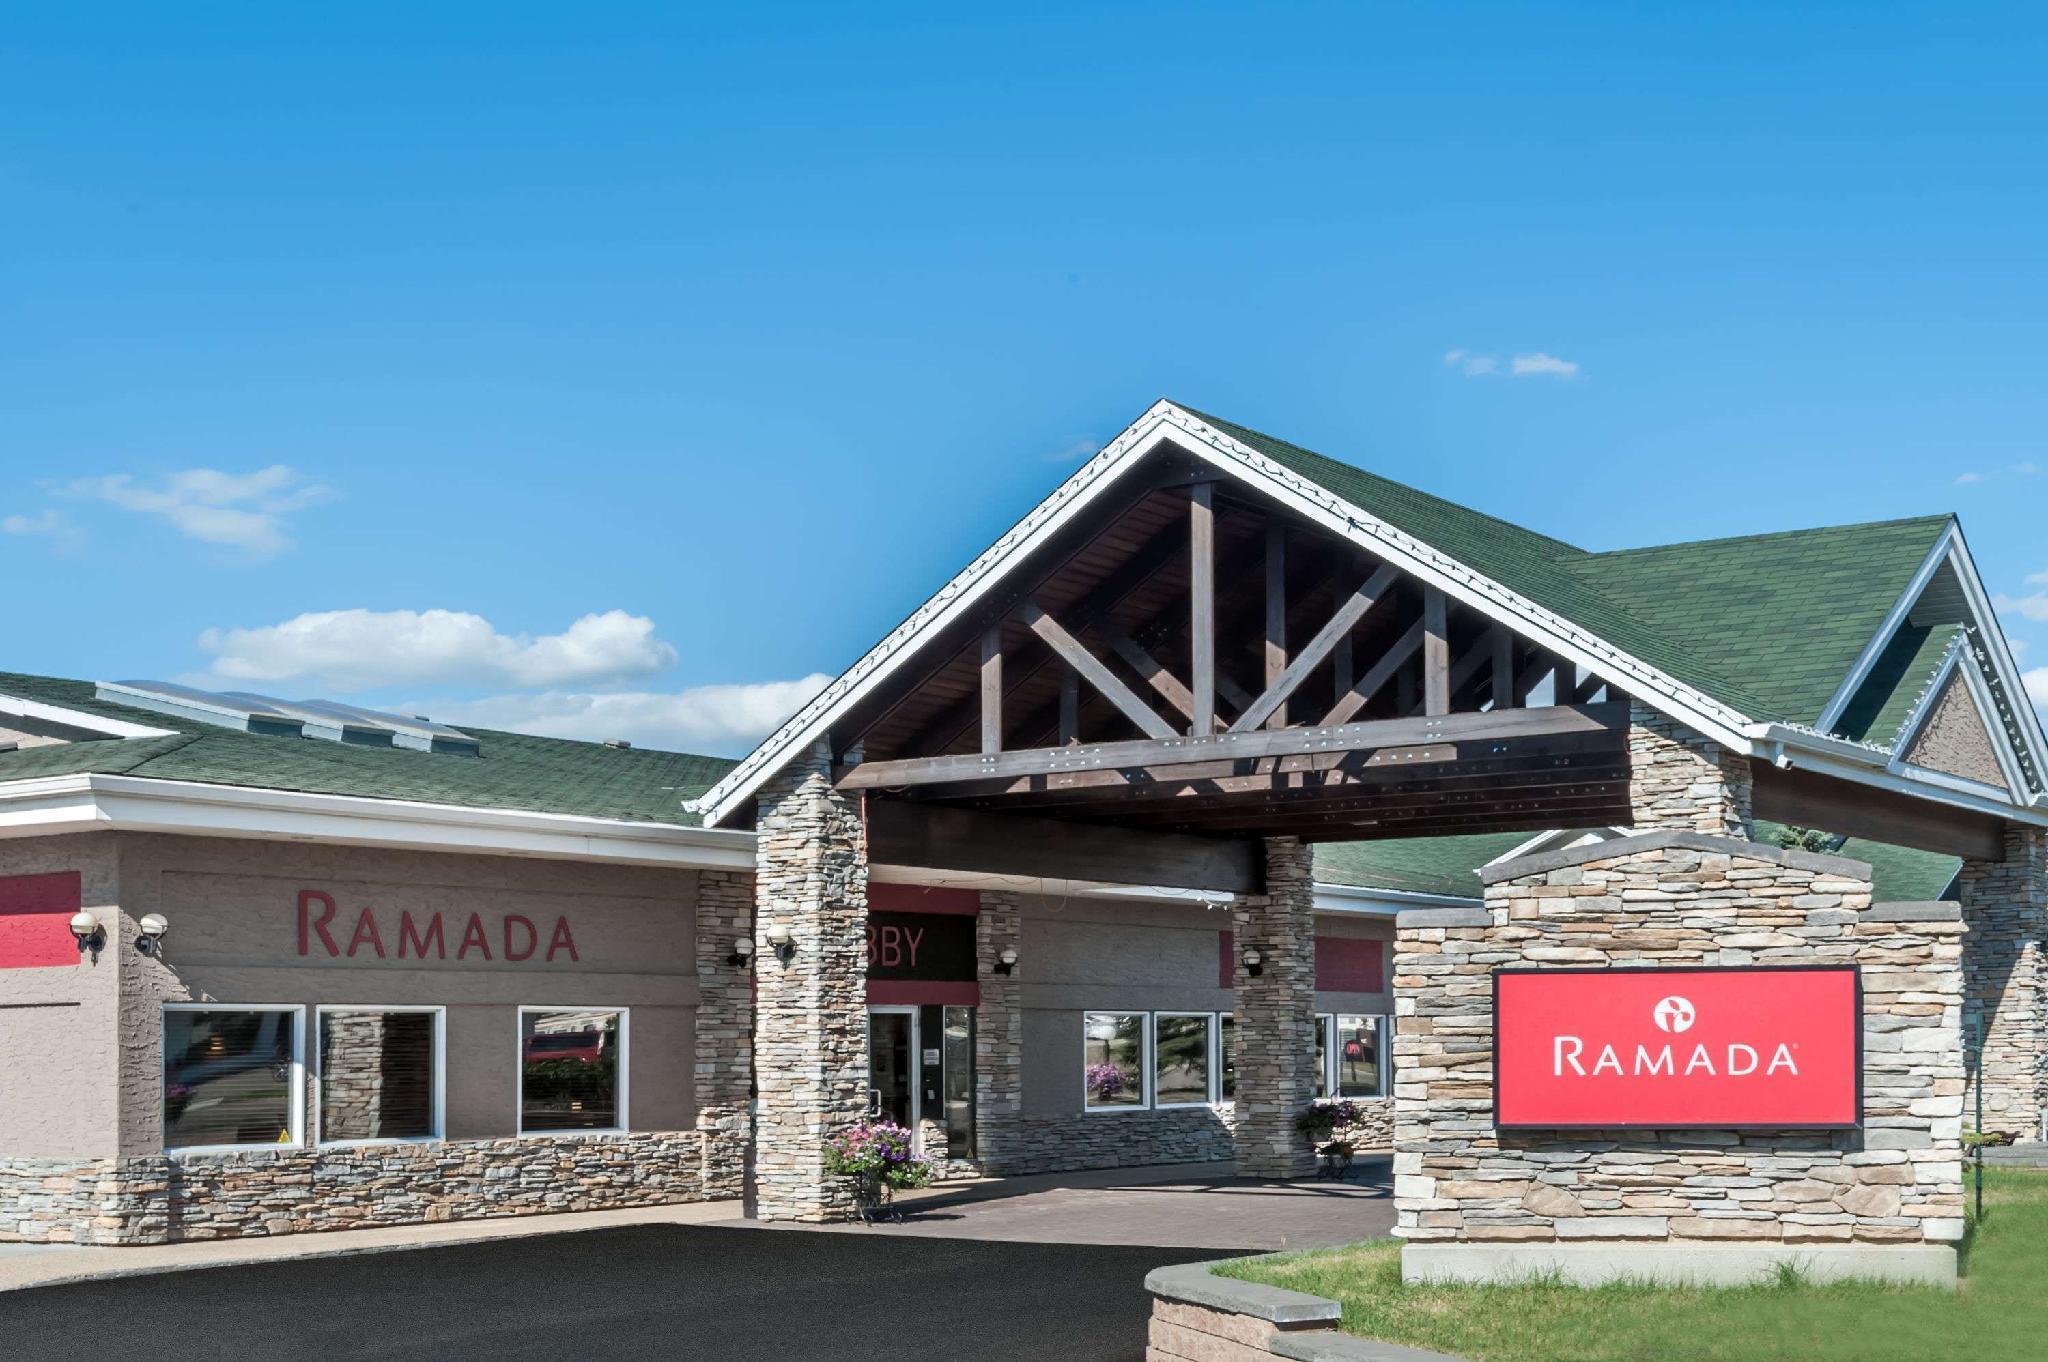 Ramada By Wyndham Stony Plain Hotel And Suites